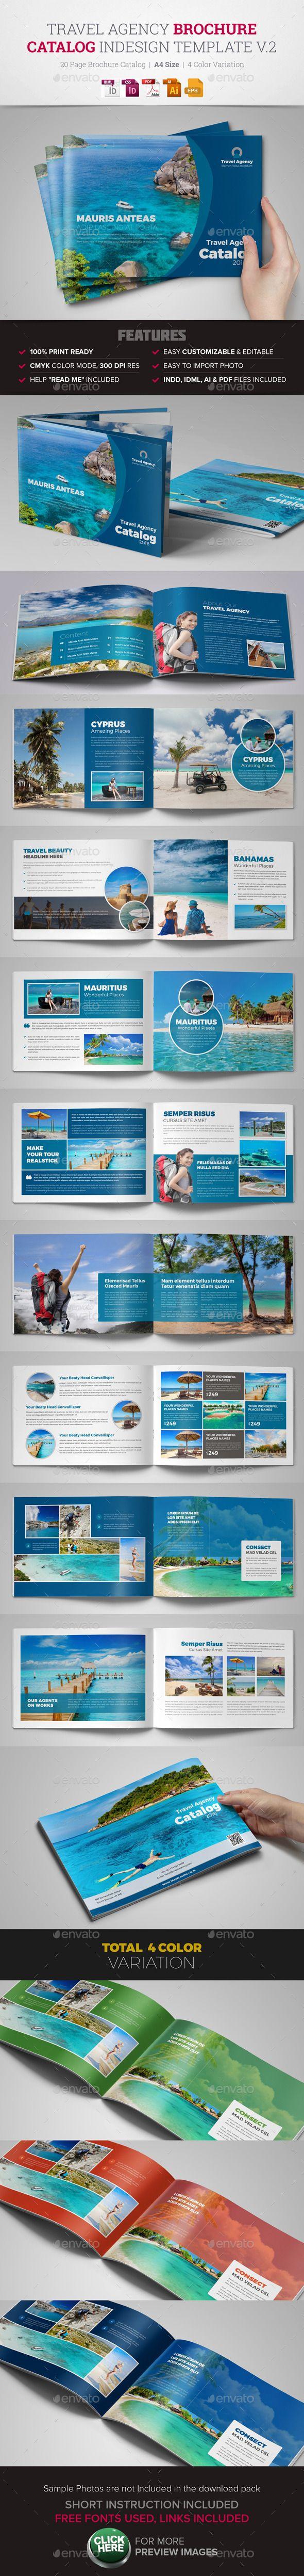 150 best tourism travel layout images on pinterest flyer design